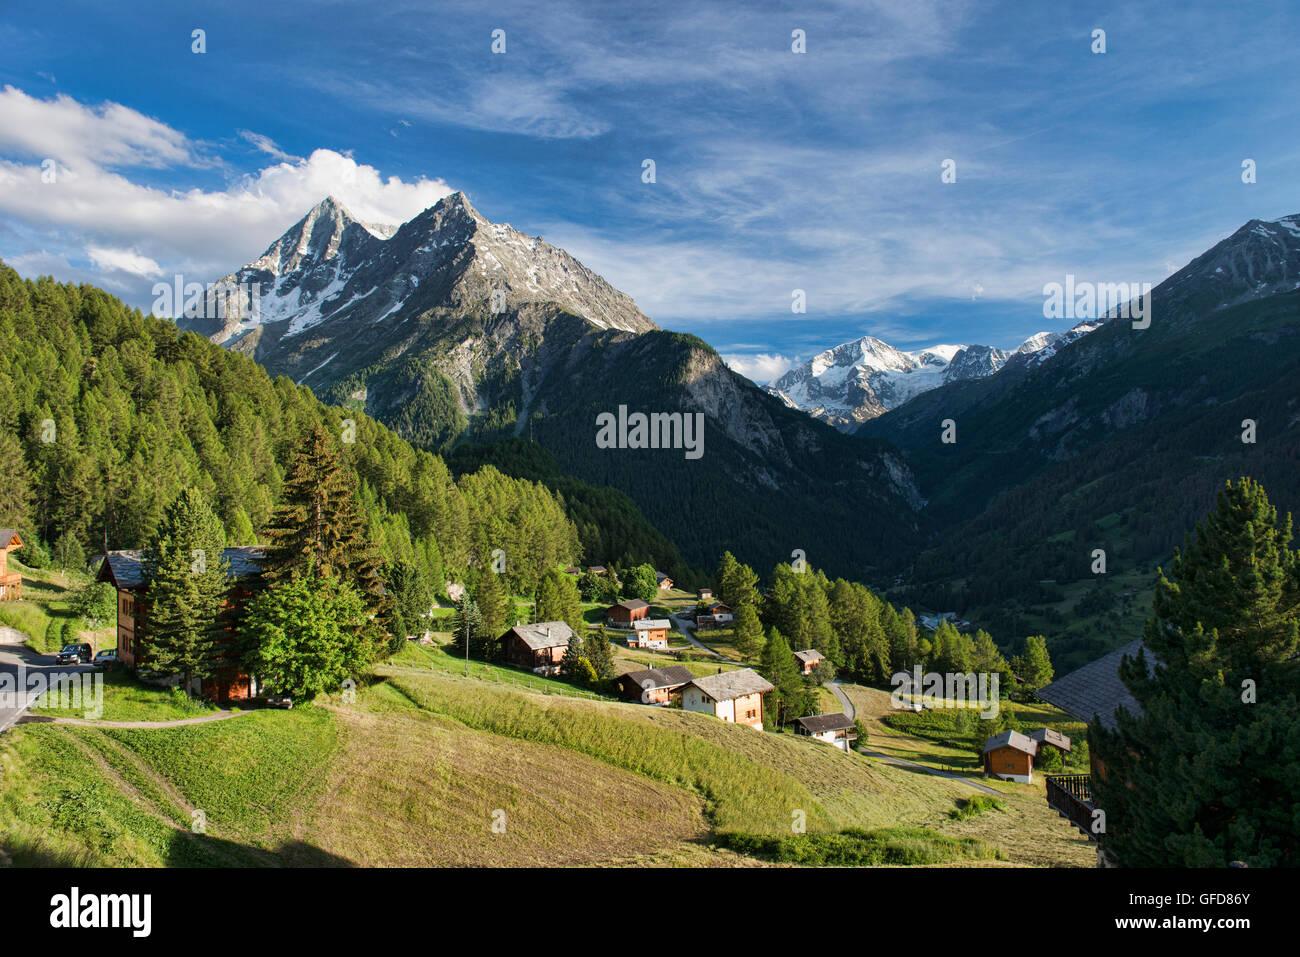 Beautiful alpine views of Pigne d'Arolla from the hamlet of La Sage, Val d'Hérens, Switzerland Stock Photo